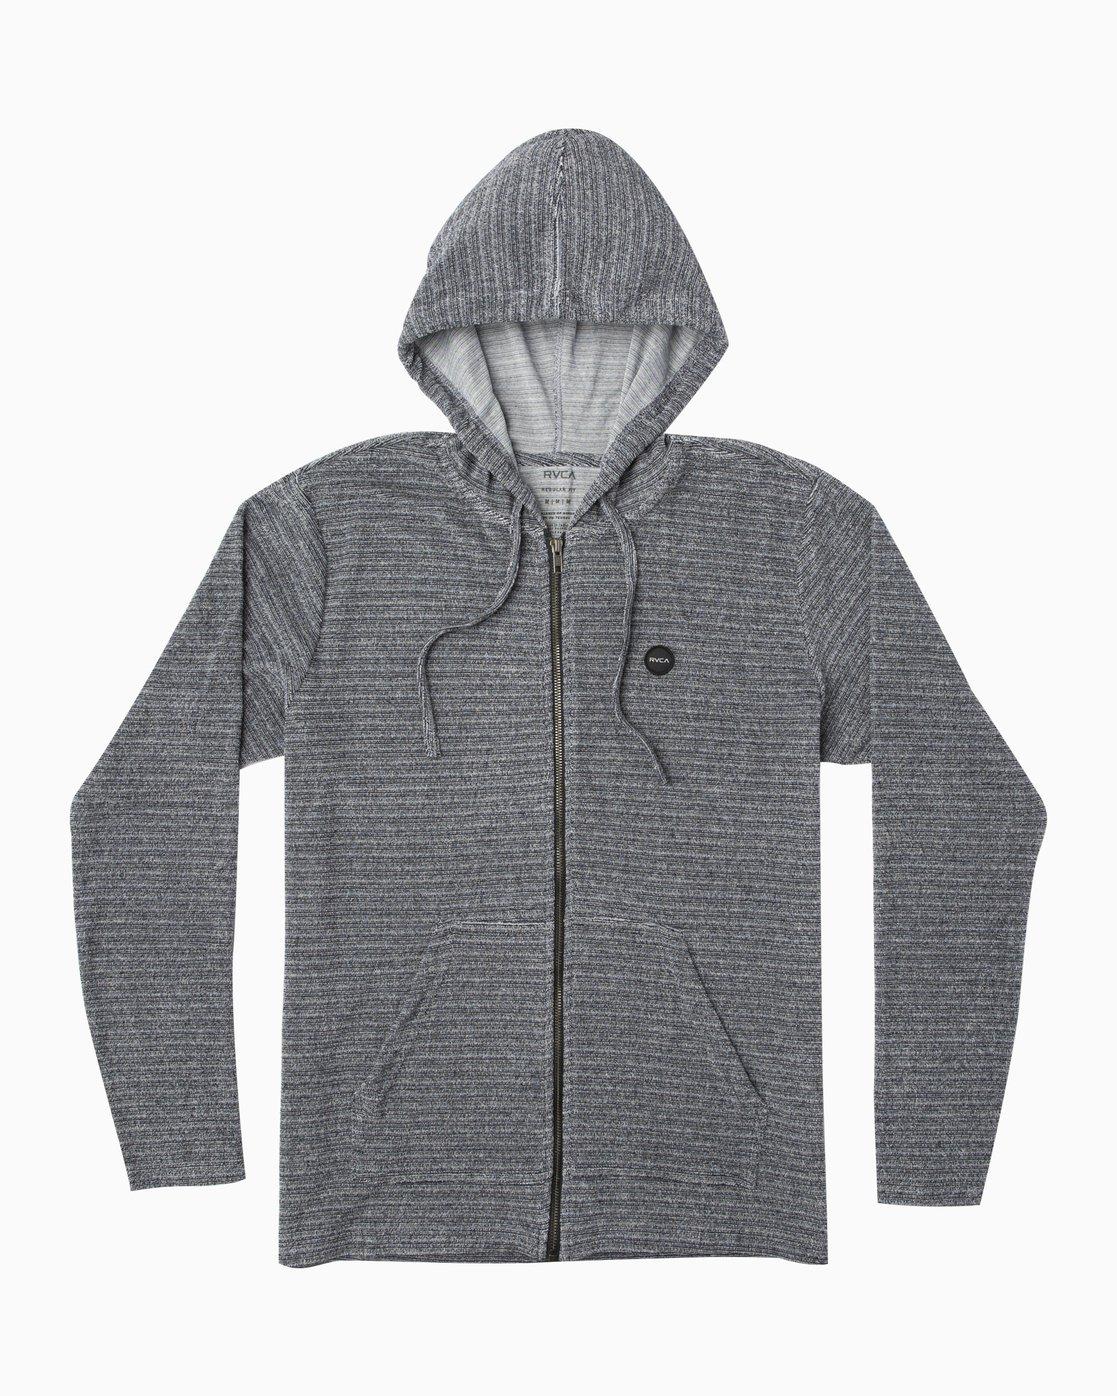 0 Super Marle Zip T-Shirt Hoodie Blue M952QRSM RVCA